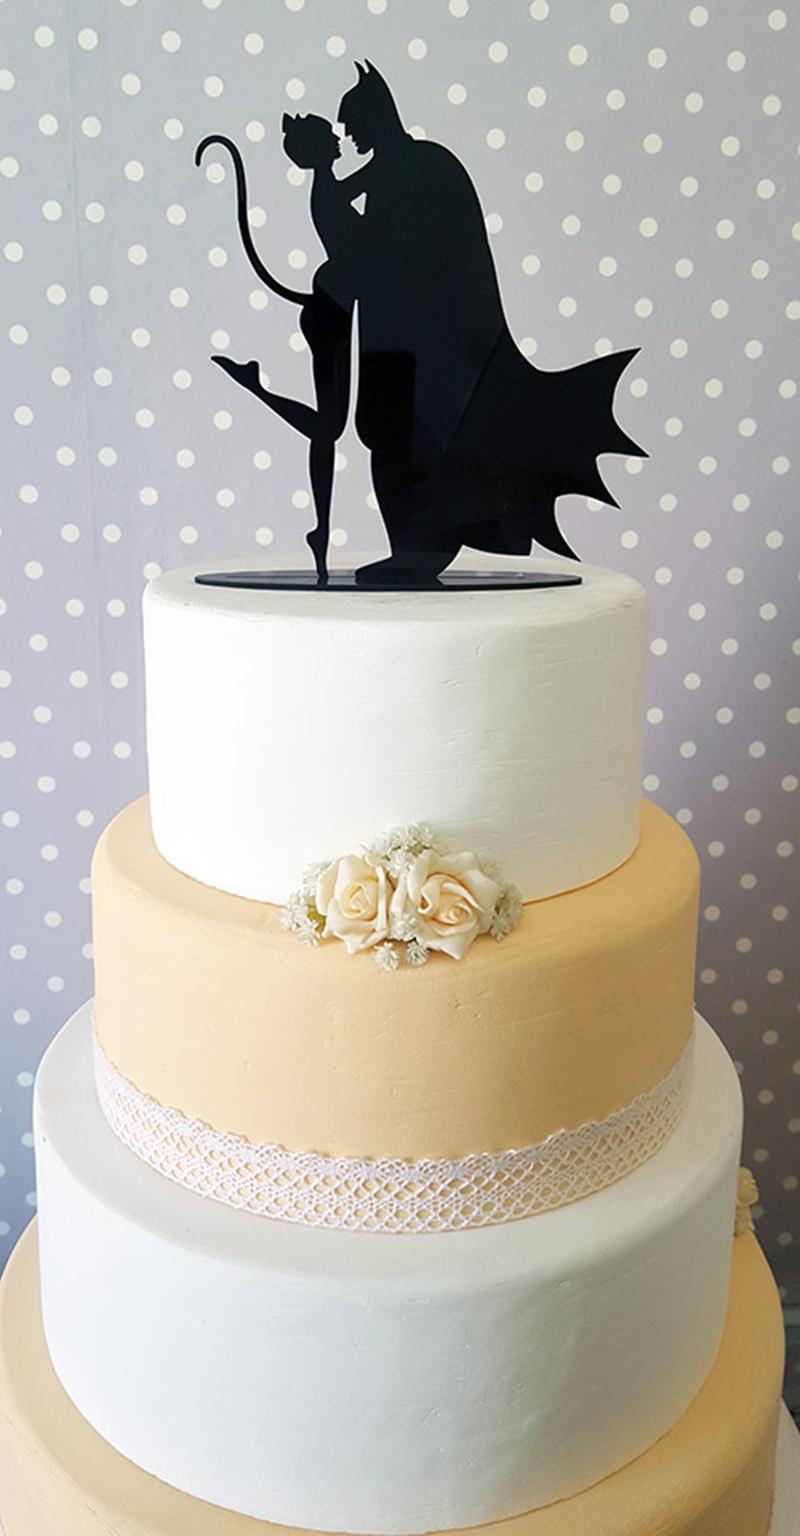 36-Noivinhos-topo-de-bolo-casamento